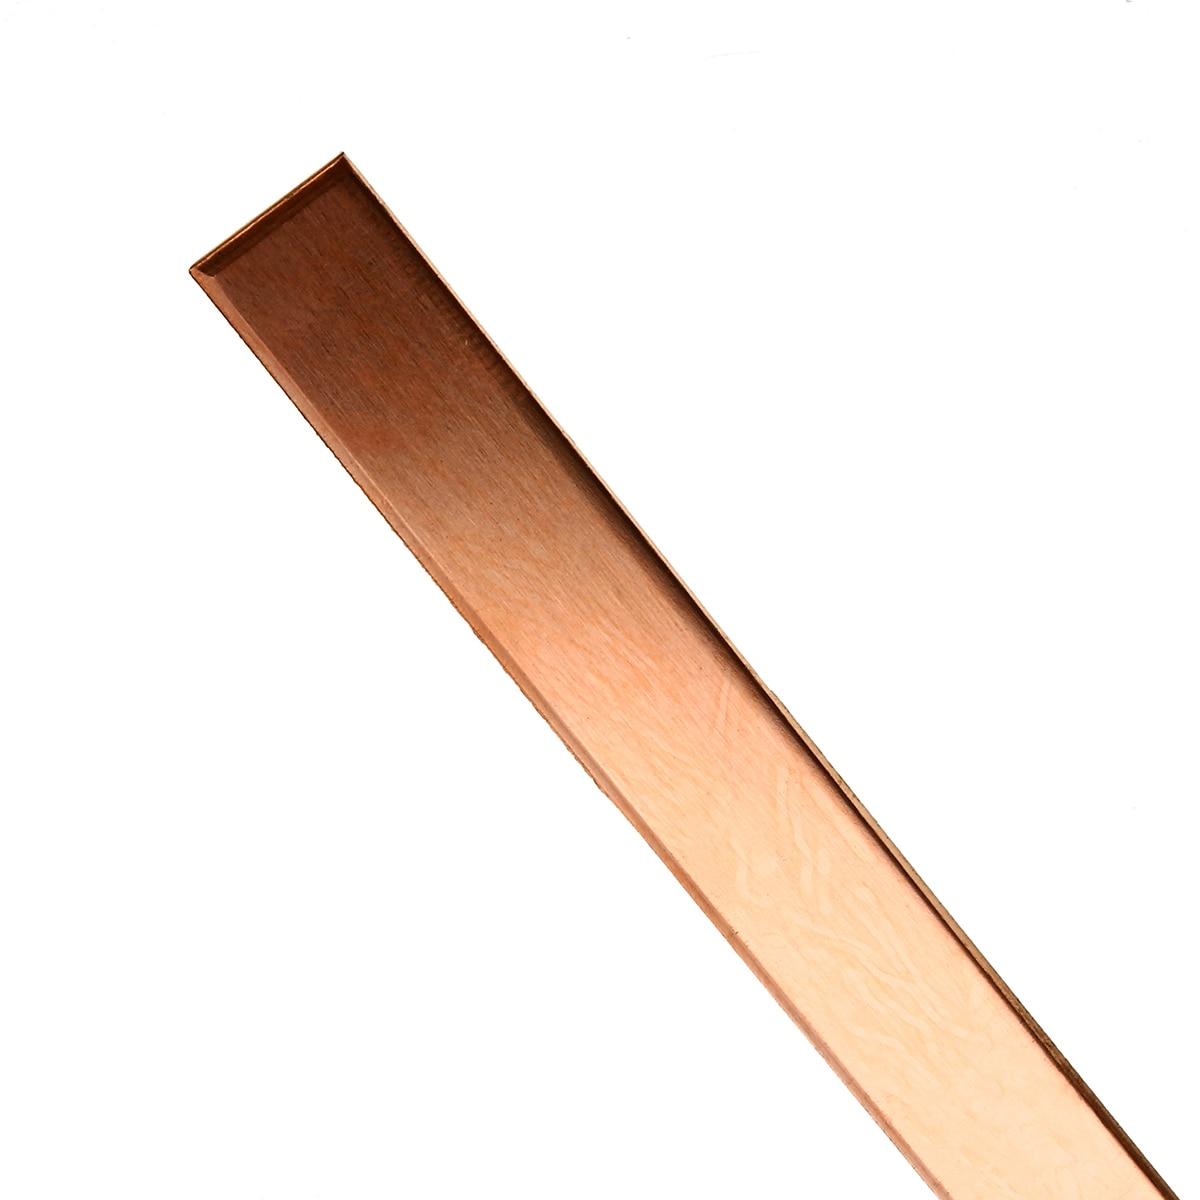 99% High Purity Copper Strip T2 Cu Metal Sheet Plate Pure Copper Bar For DIY CNC PCB Kit Laminate Circuit Board 1.5mm*10mm*250mm